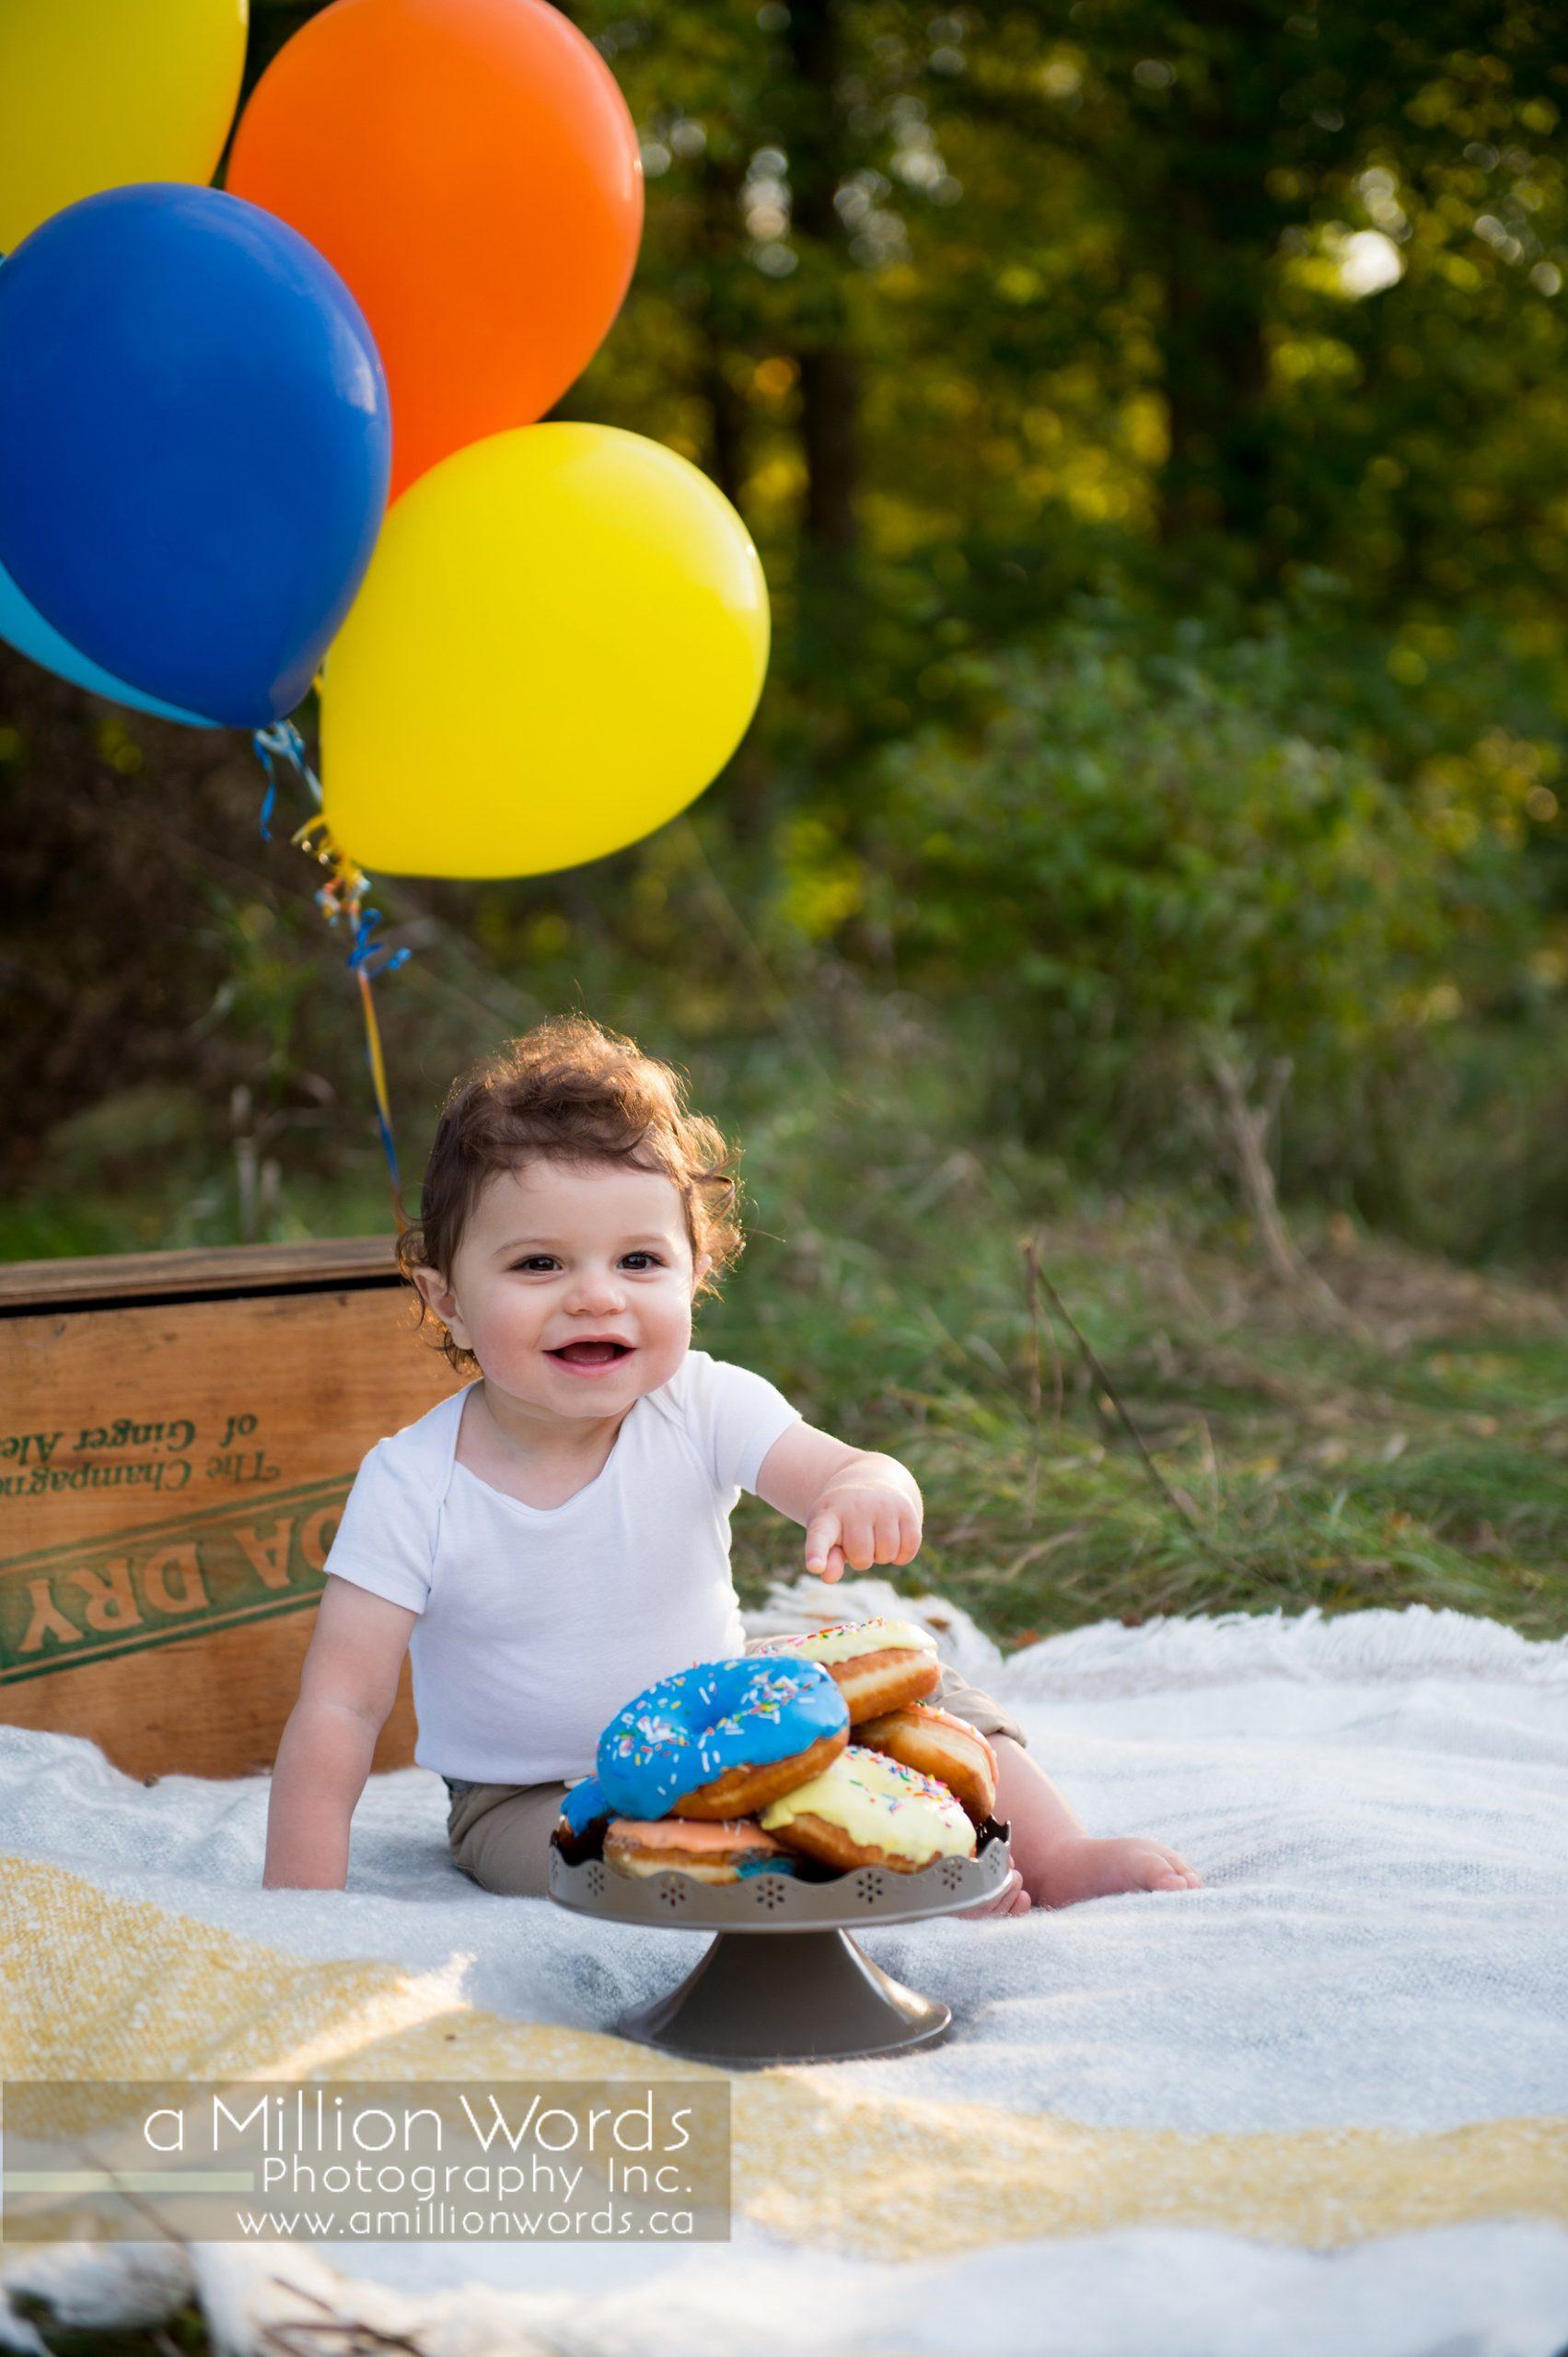 guelph_kids_birthday_photography08